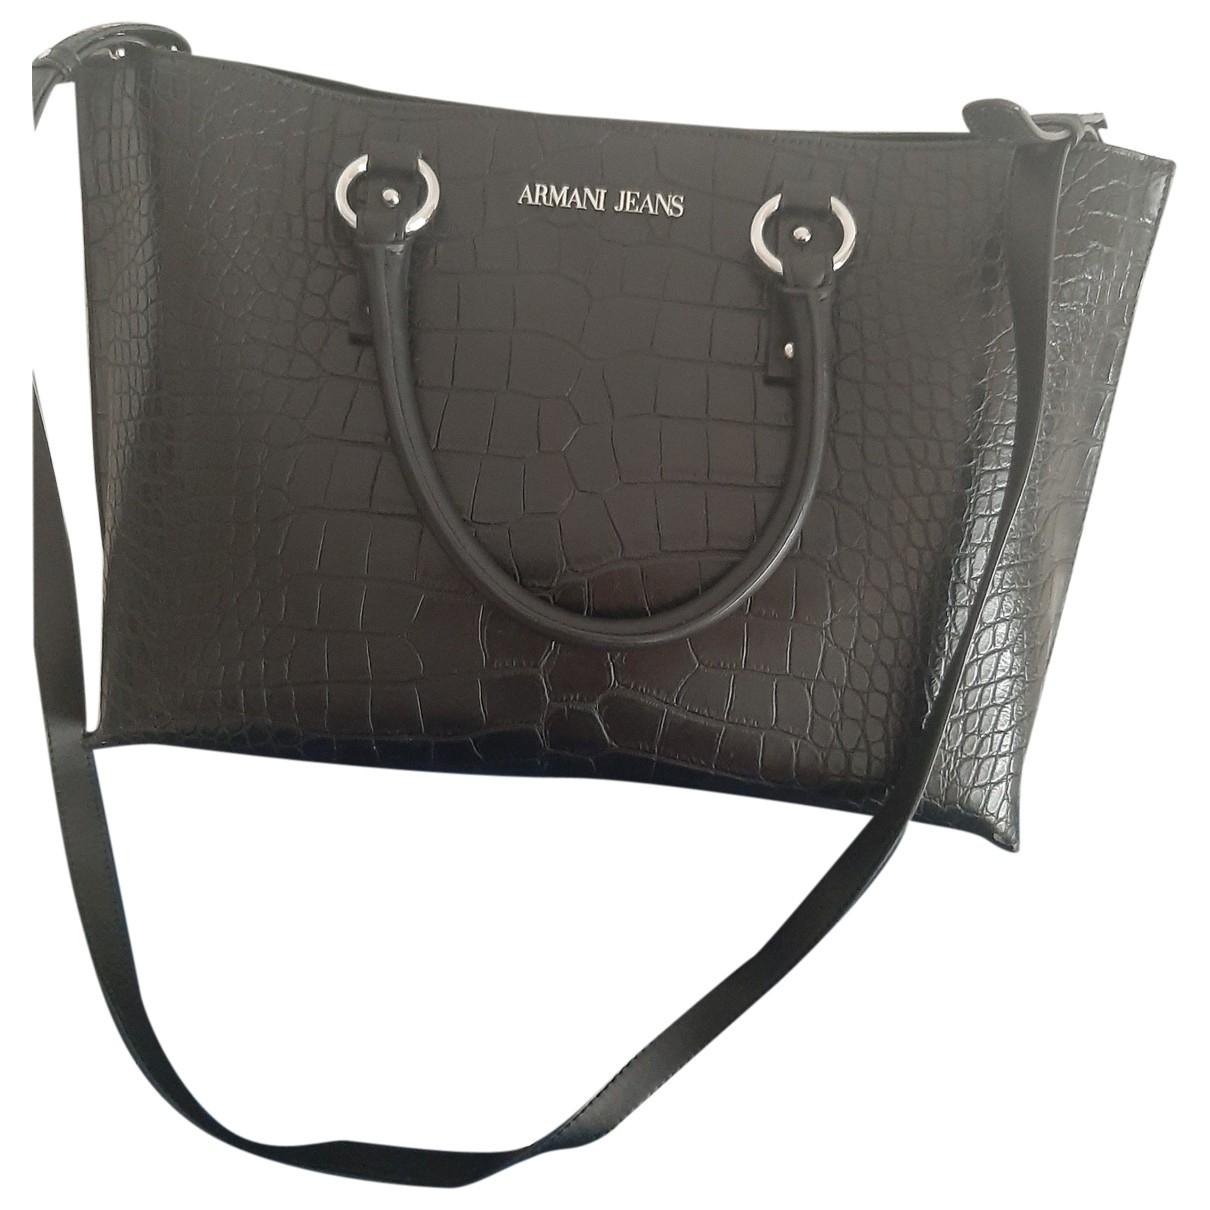 Armani Jeans \N Black Leather handbag for Women \N